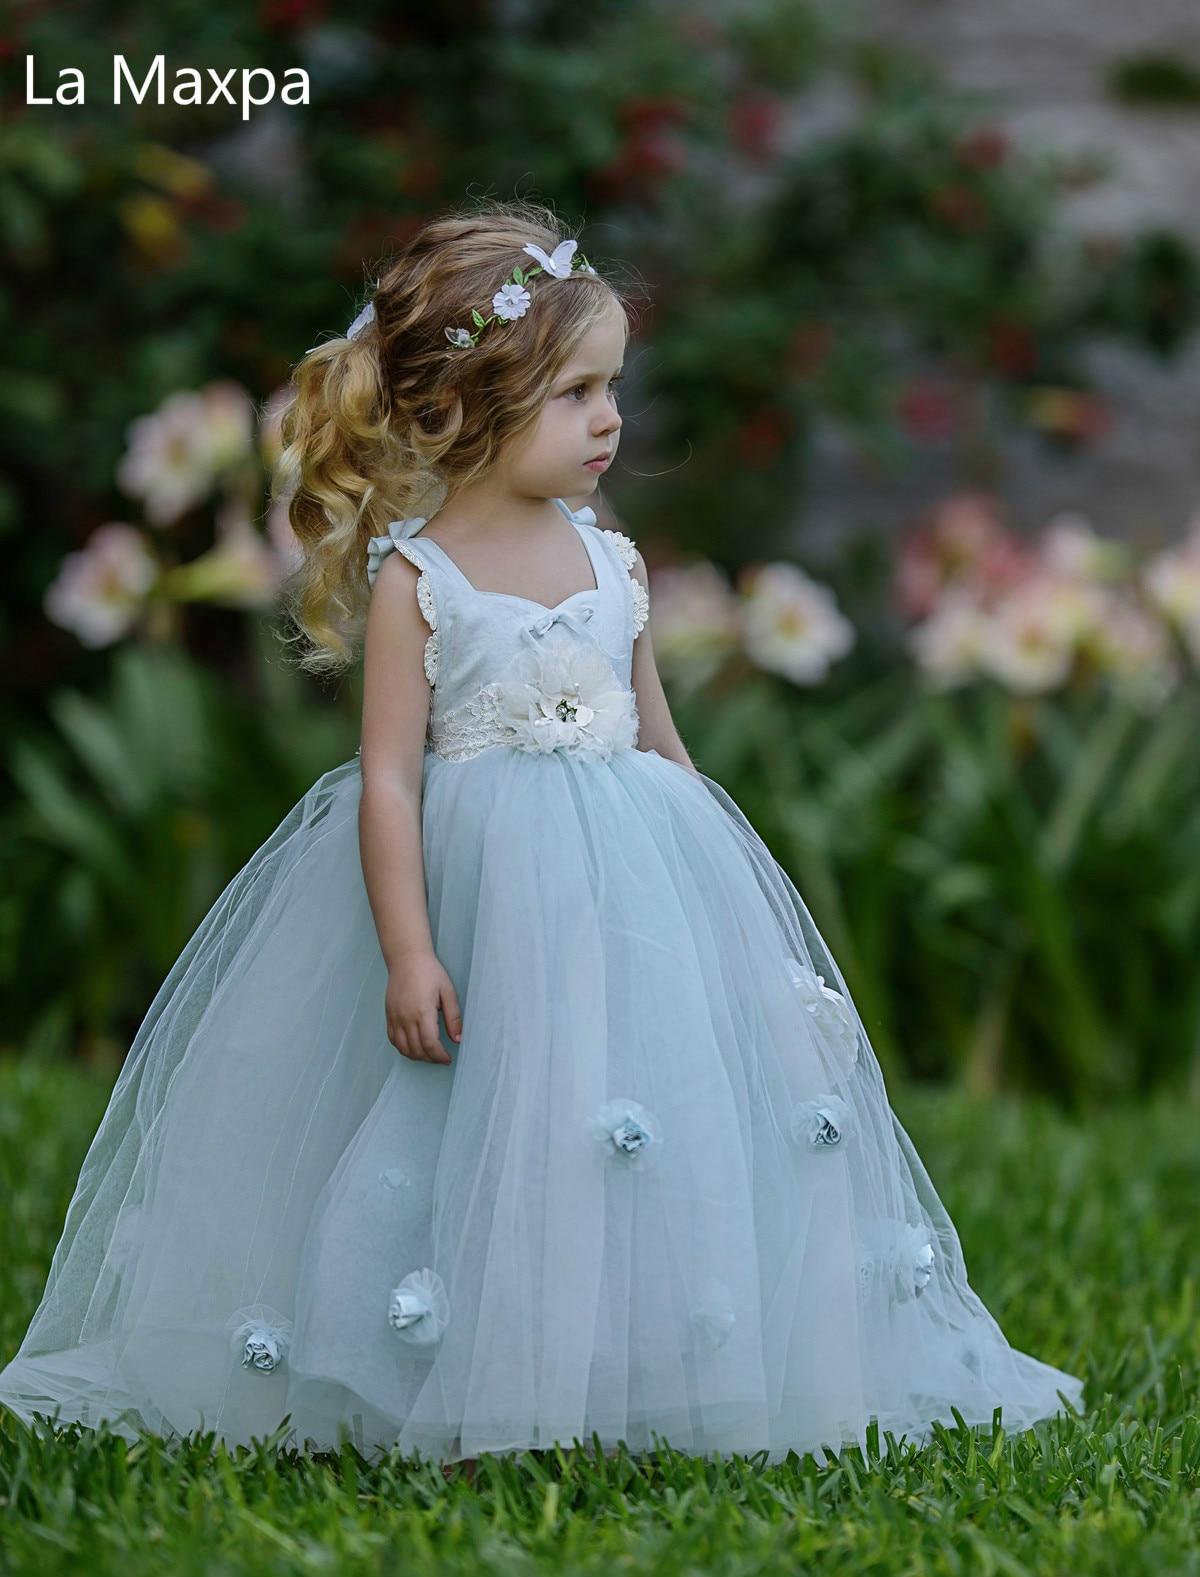 New Rose Flower Lace Dress Girls Wedding Birthday Party Evening Dress Blue Children Performance Beautiful Tutu Ball Gown Dress lace high low swing evening party dress